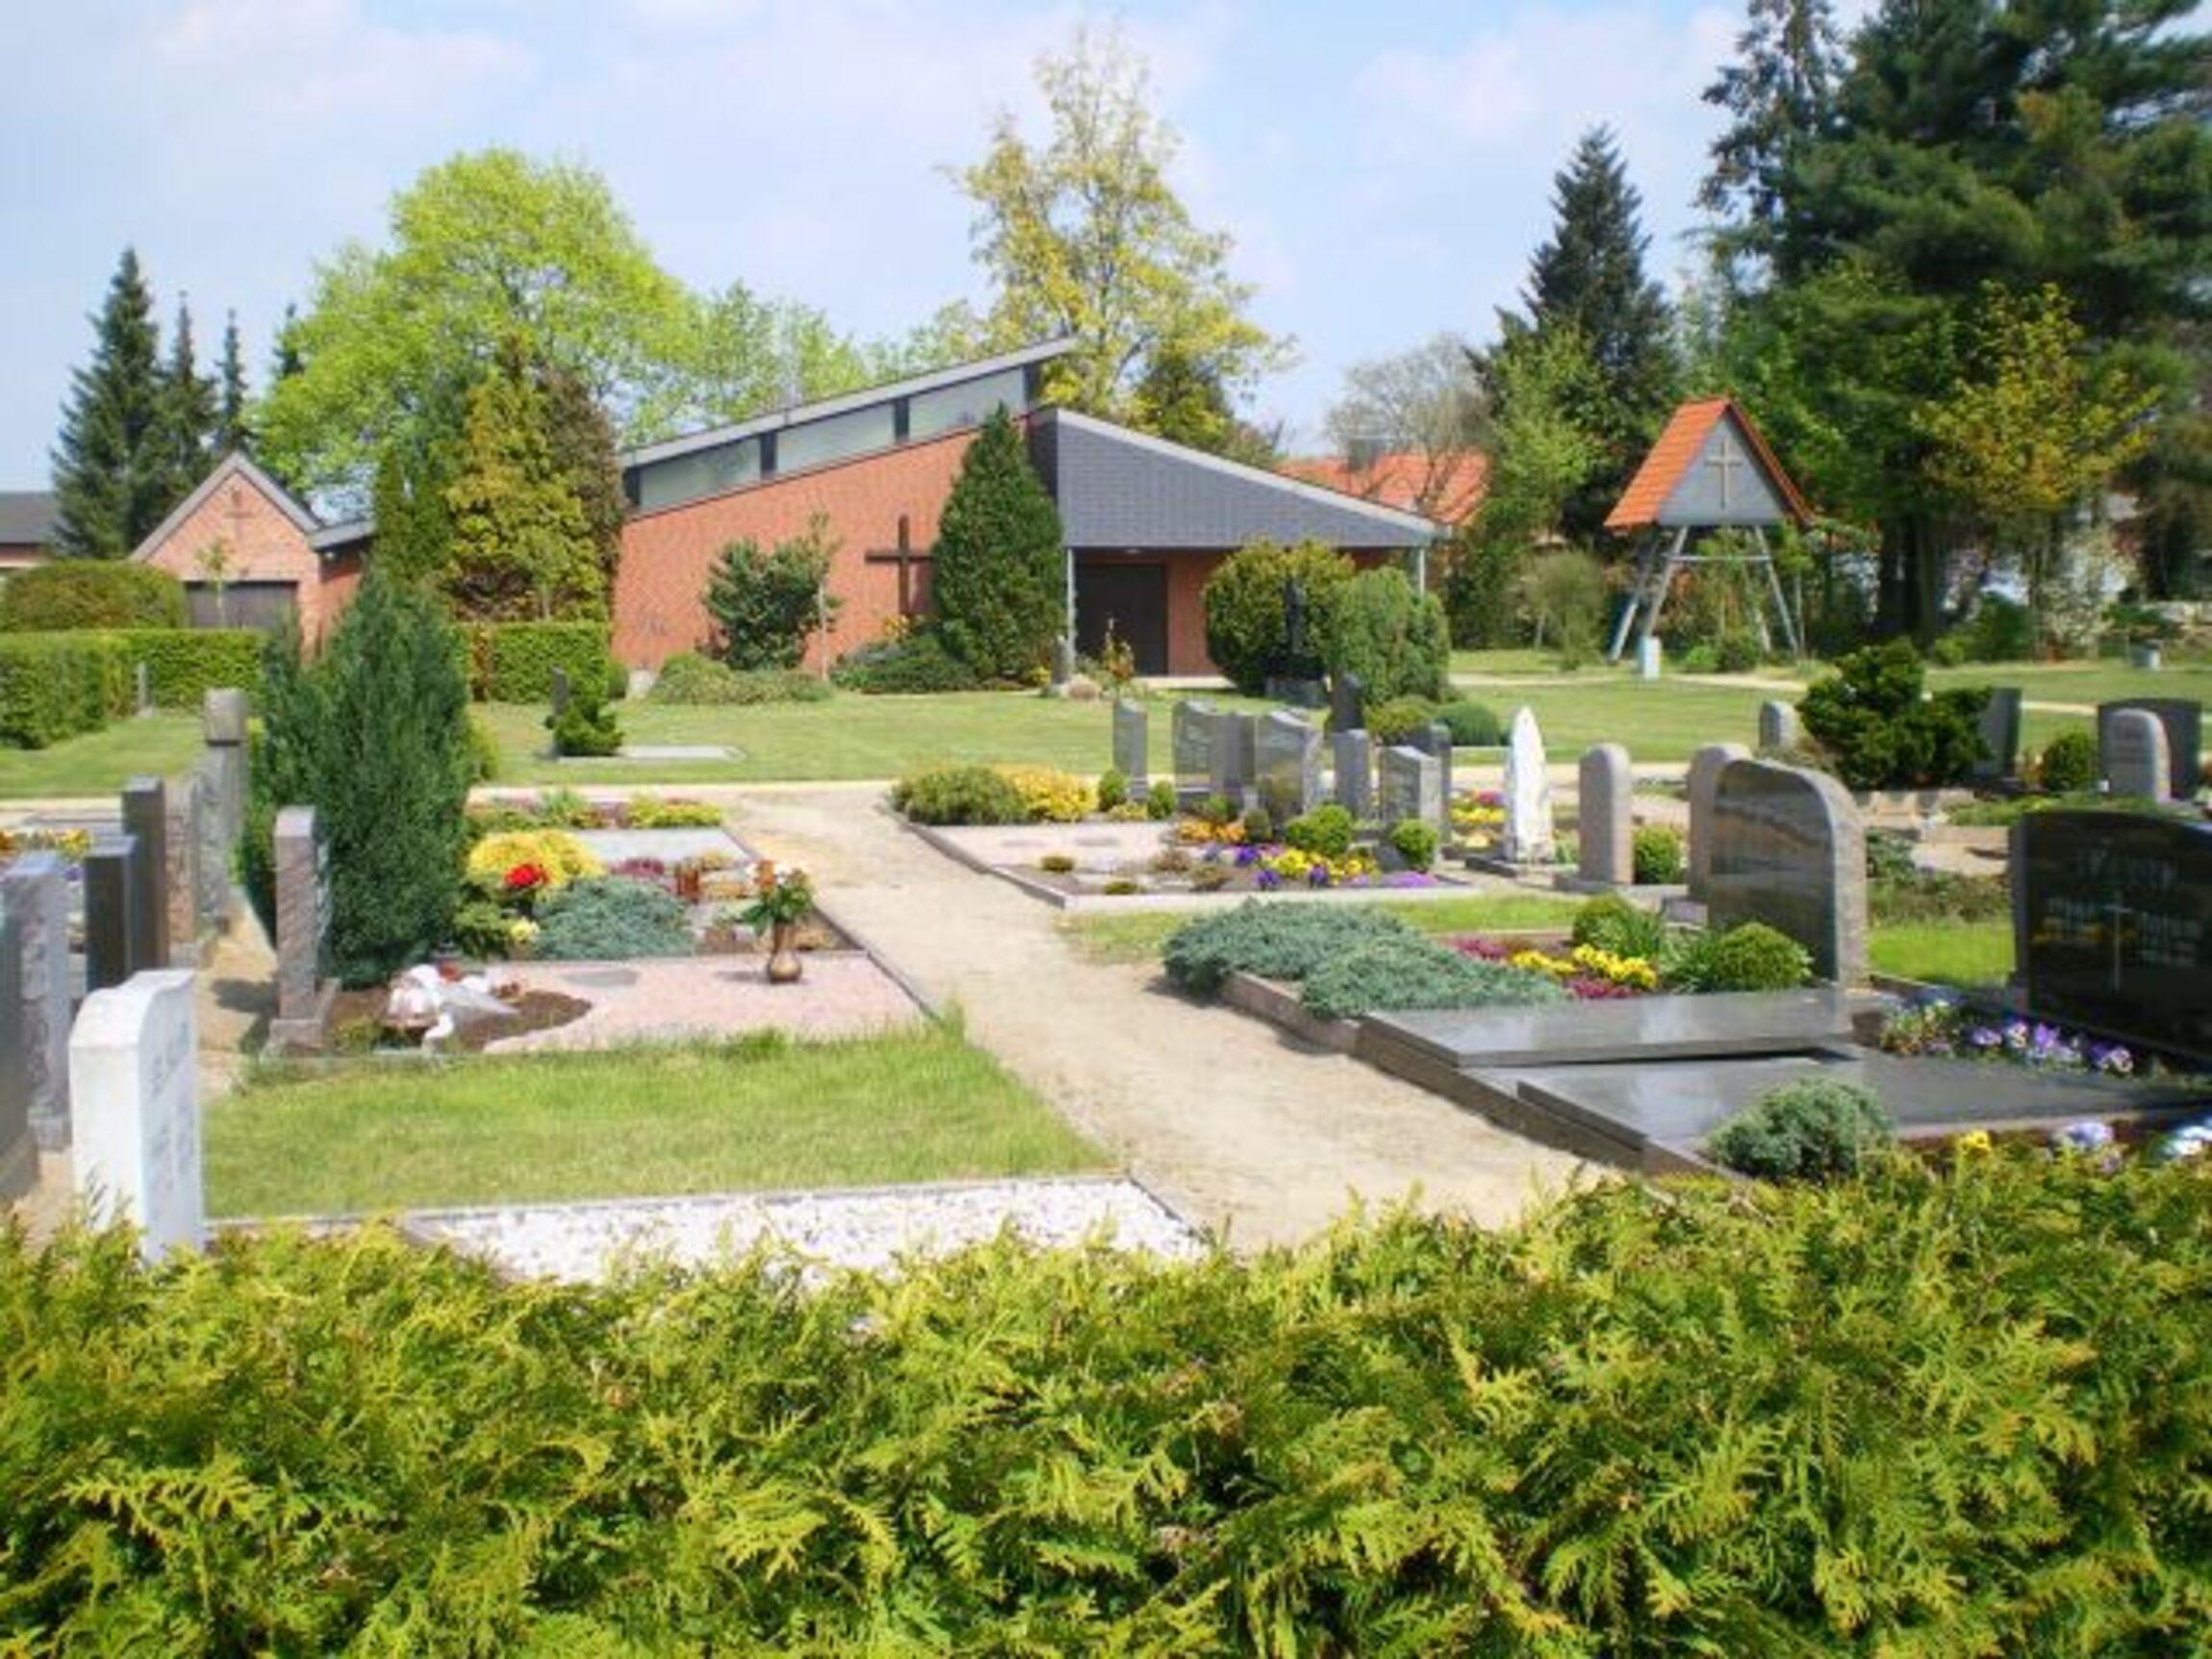 Friedhof Hillerse 1 - Edith Vogel - webo